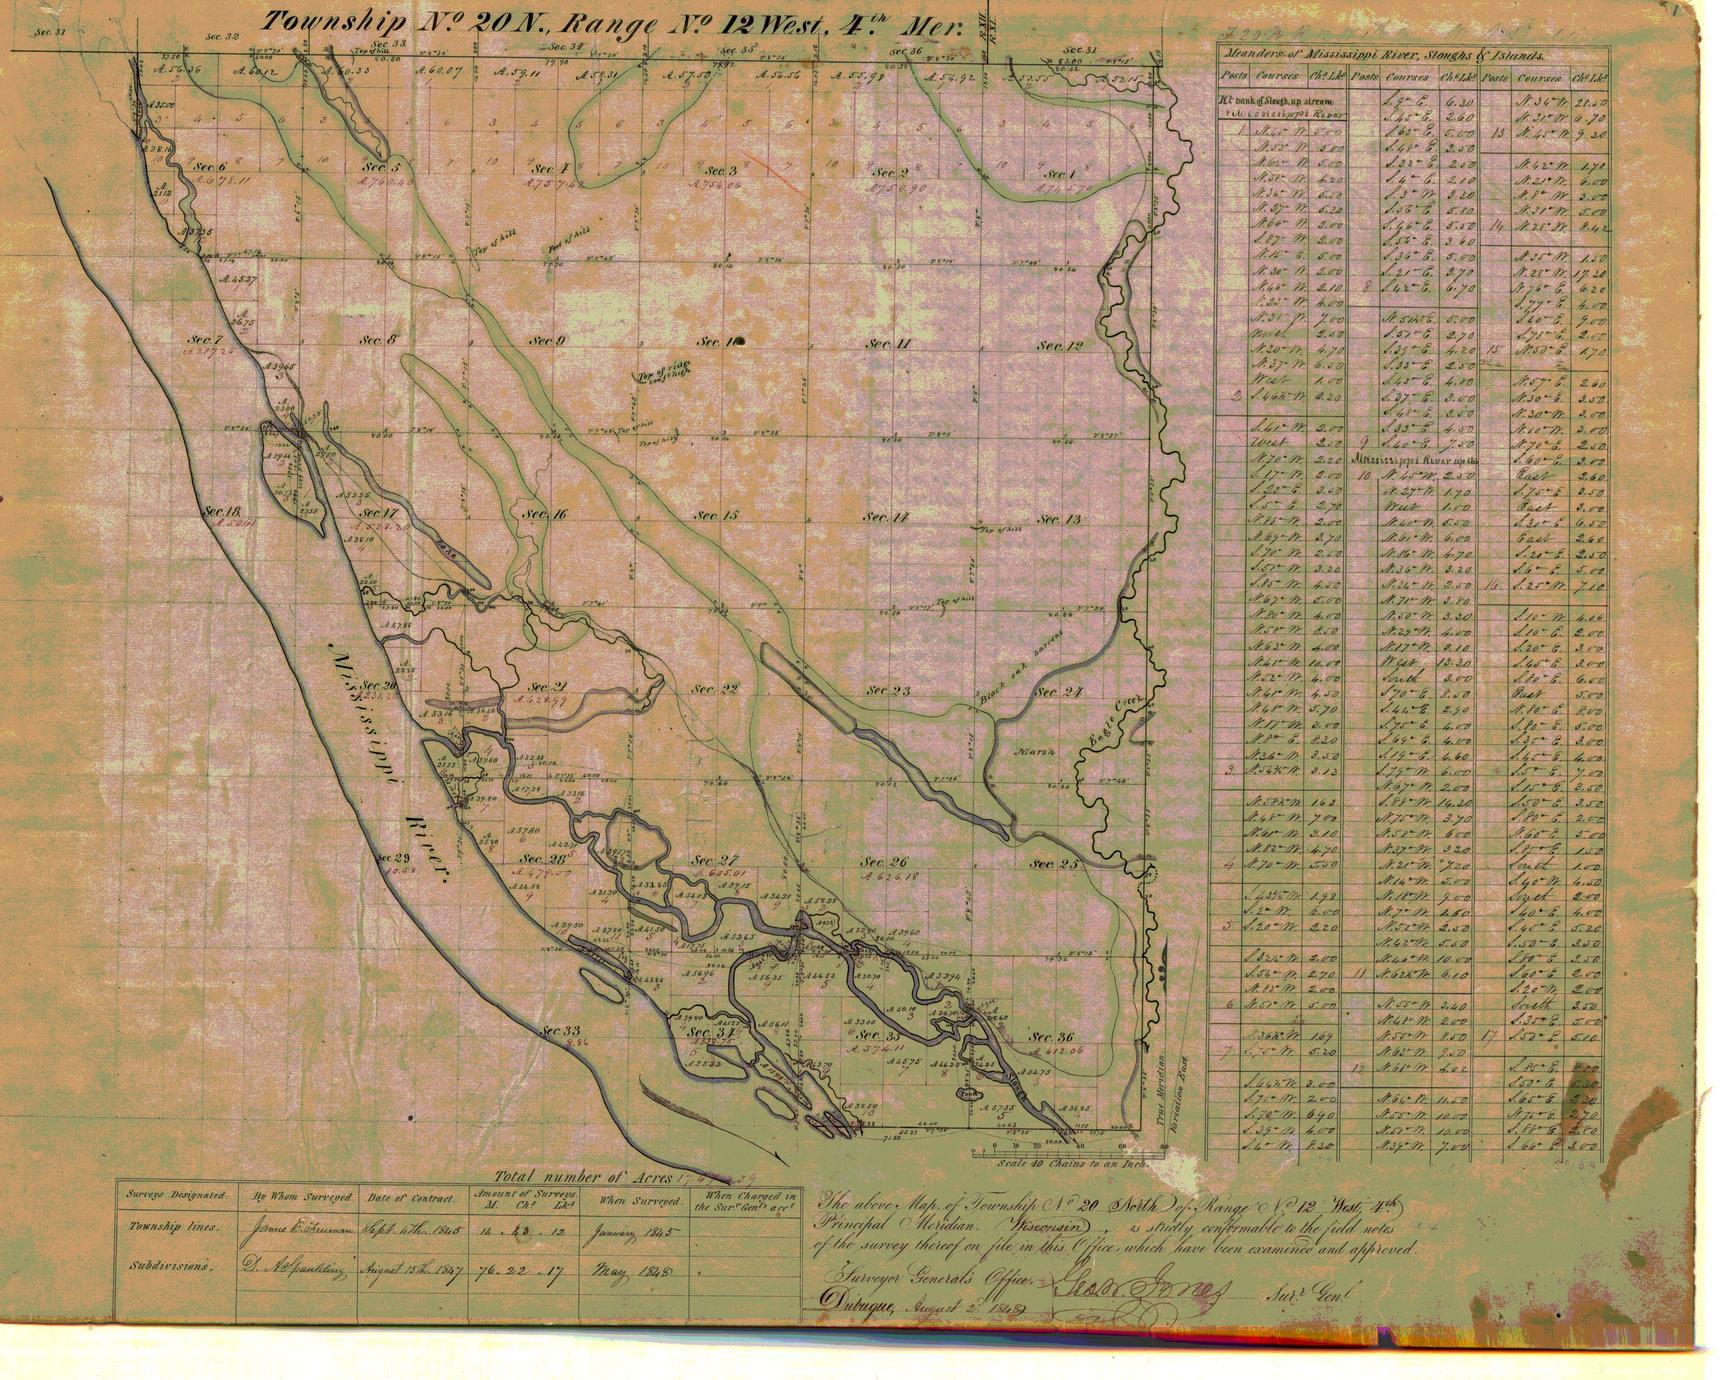 [Public Land Survey System map: Wisconsin Township 20 North, Range 12 West]